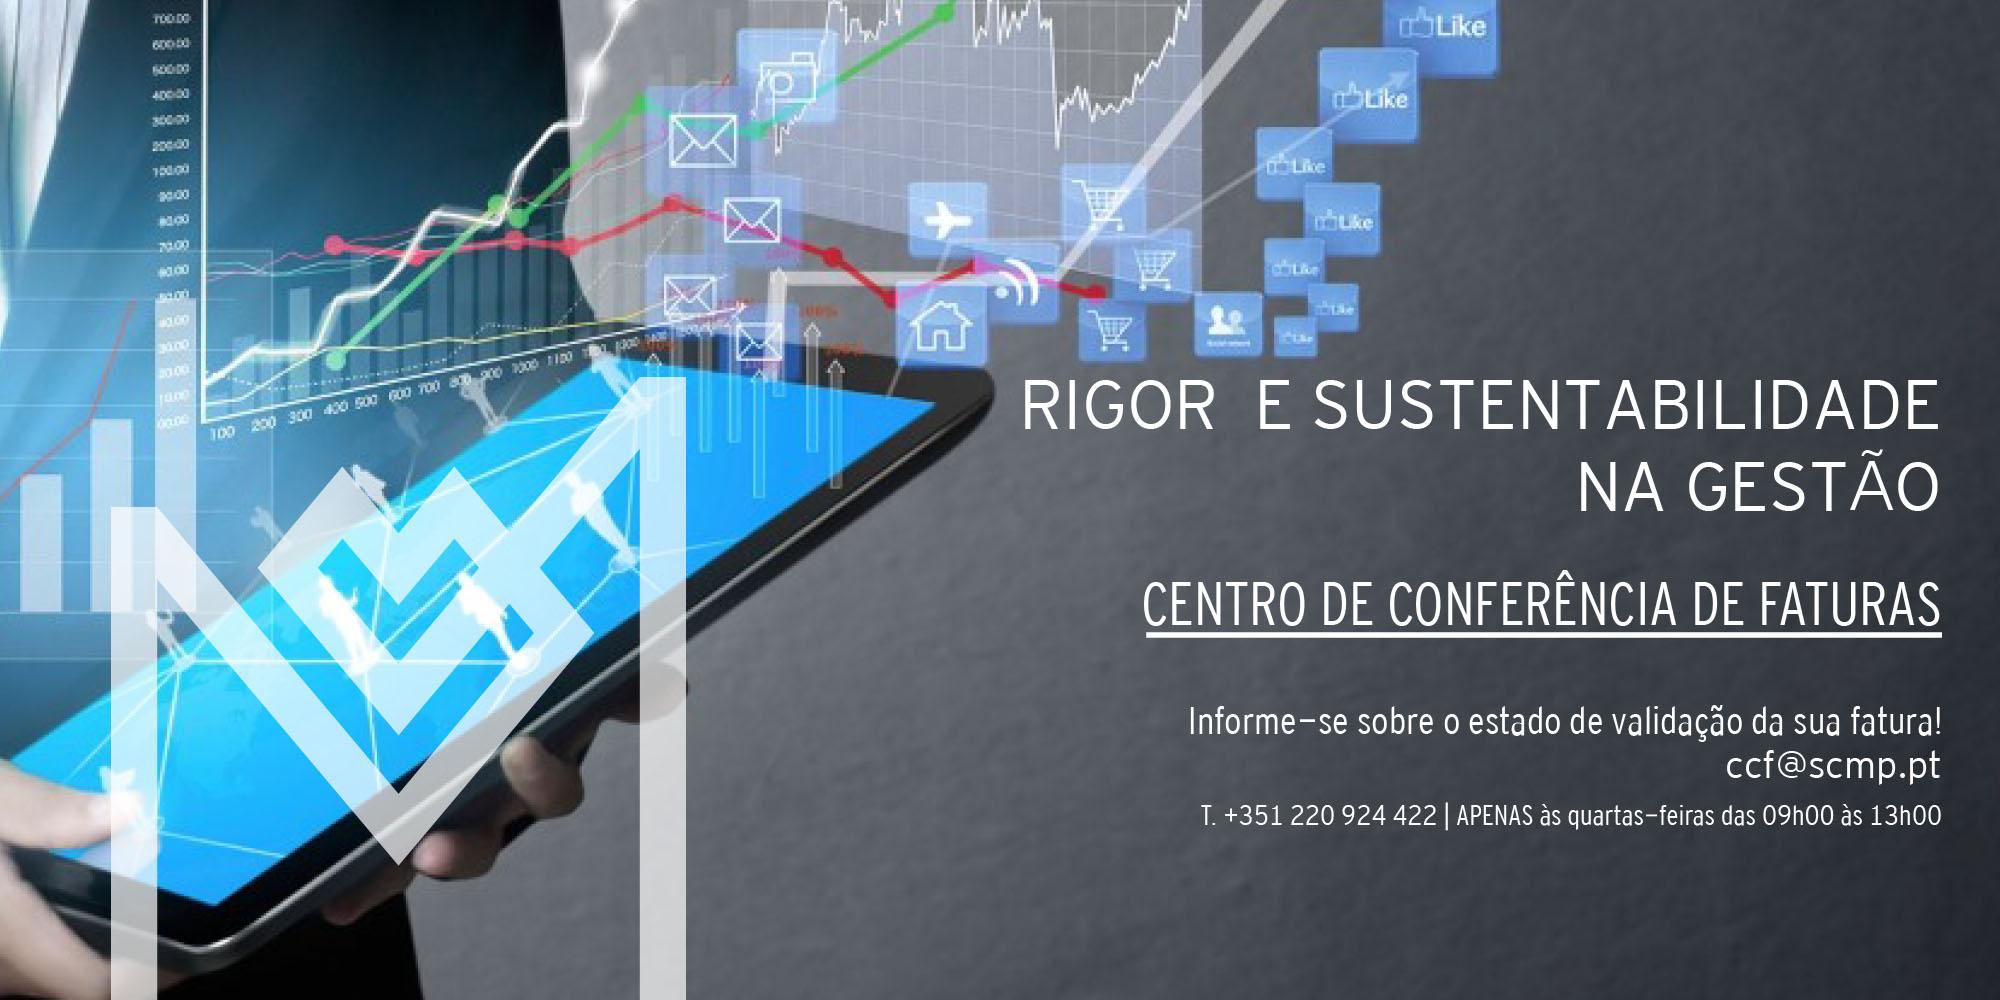 https://www.scmp.pt/assets/misc/img/Slideshow/2017/20170428%20Centro%20Conf%20faturas/SCMP%20Centro%20Conferencia%20Faturas.jpg